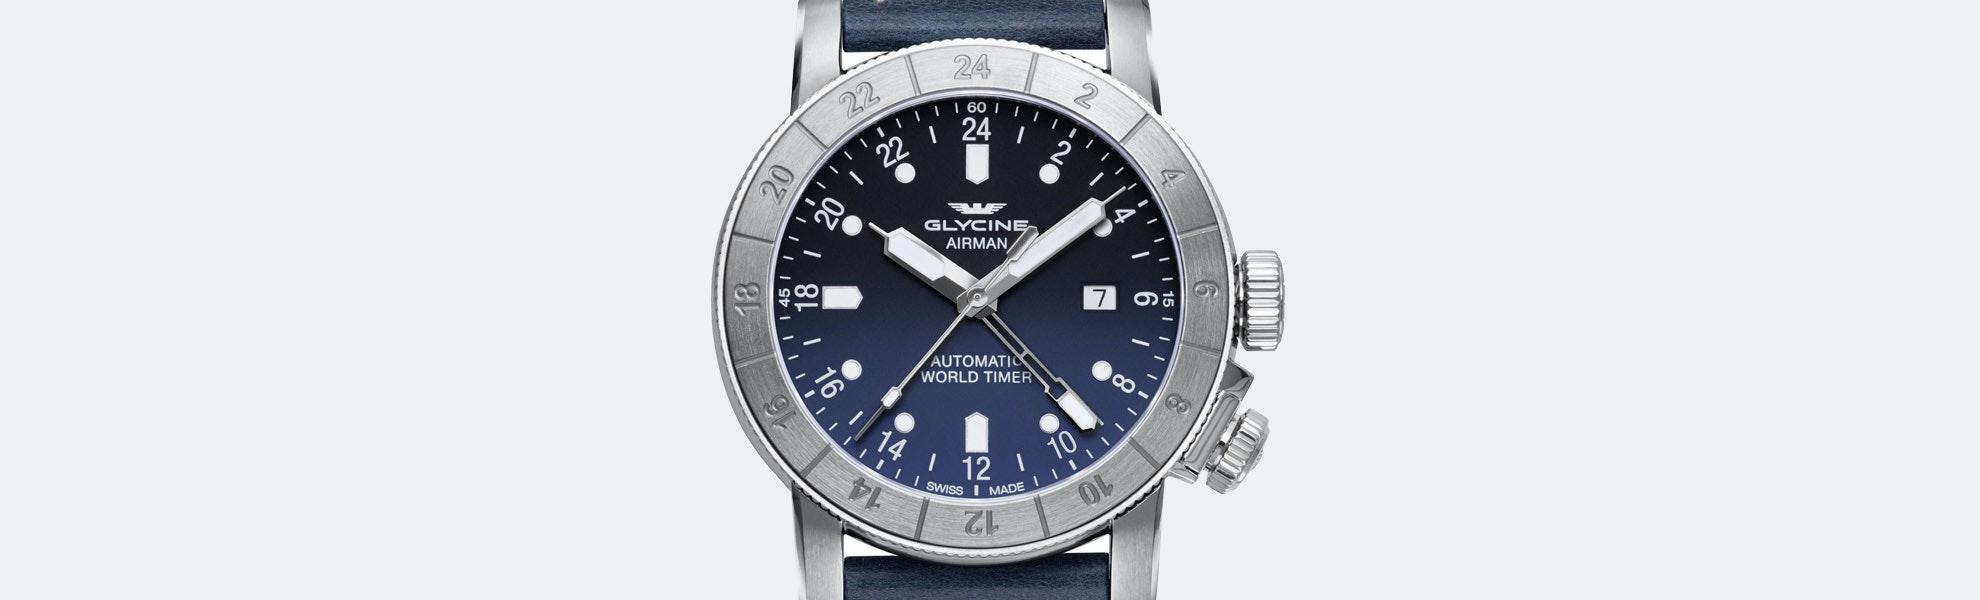 Glycine Airman 44 & 46 Automatic Watch